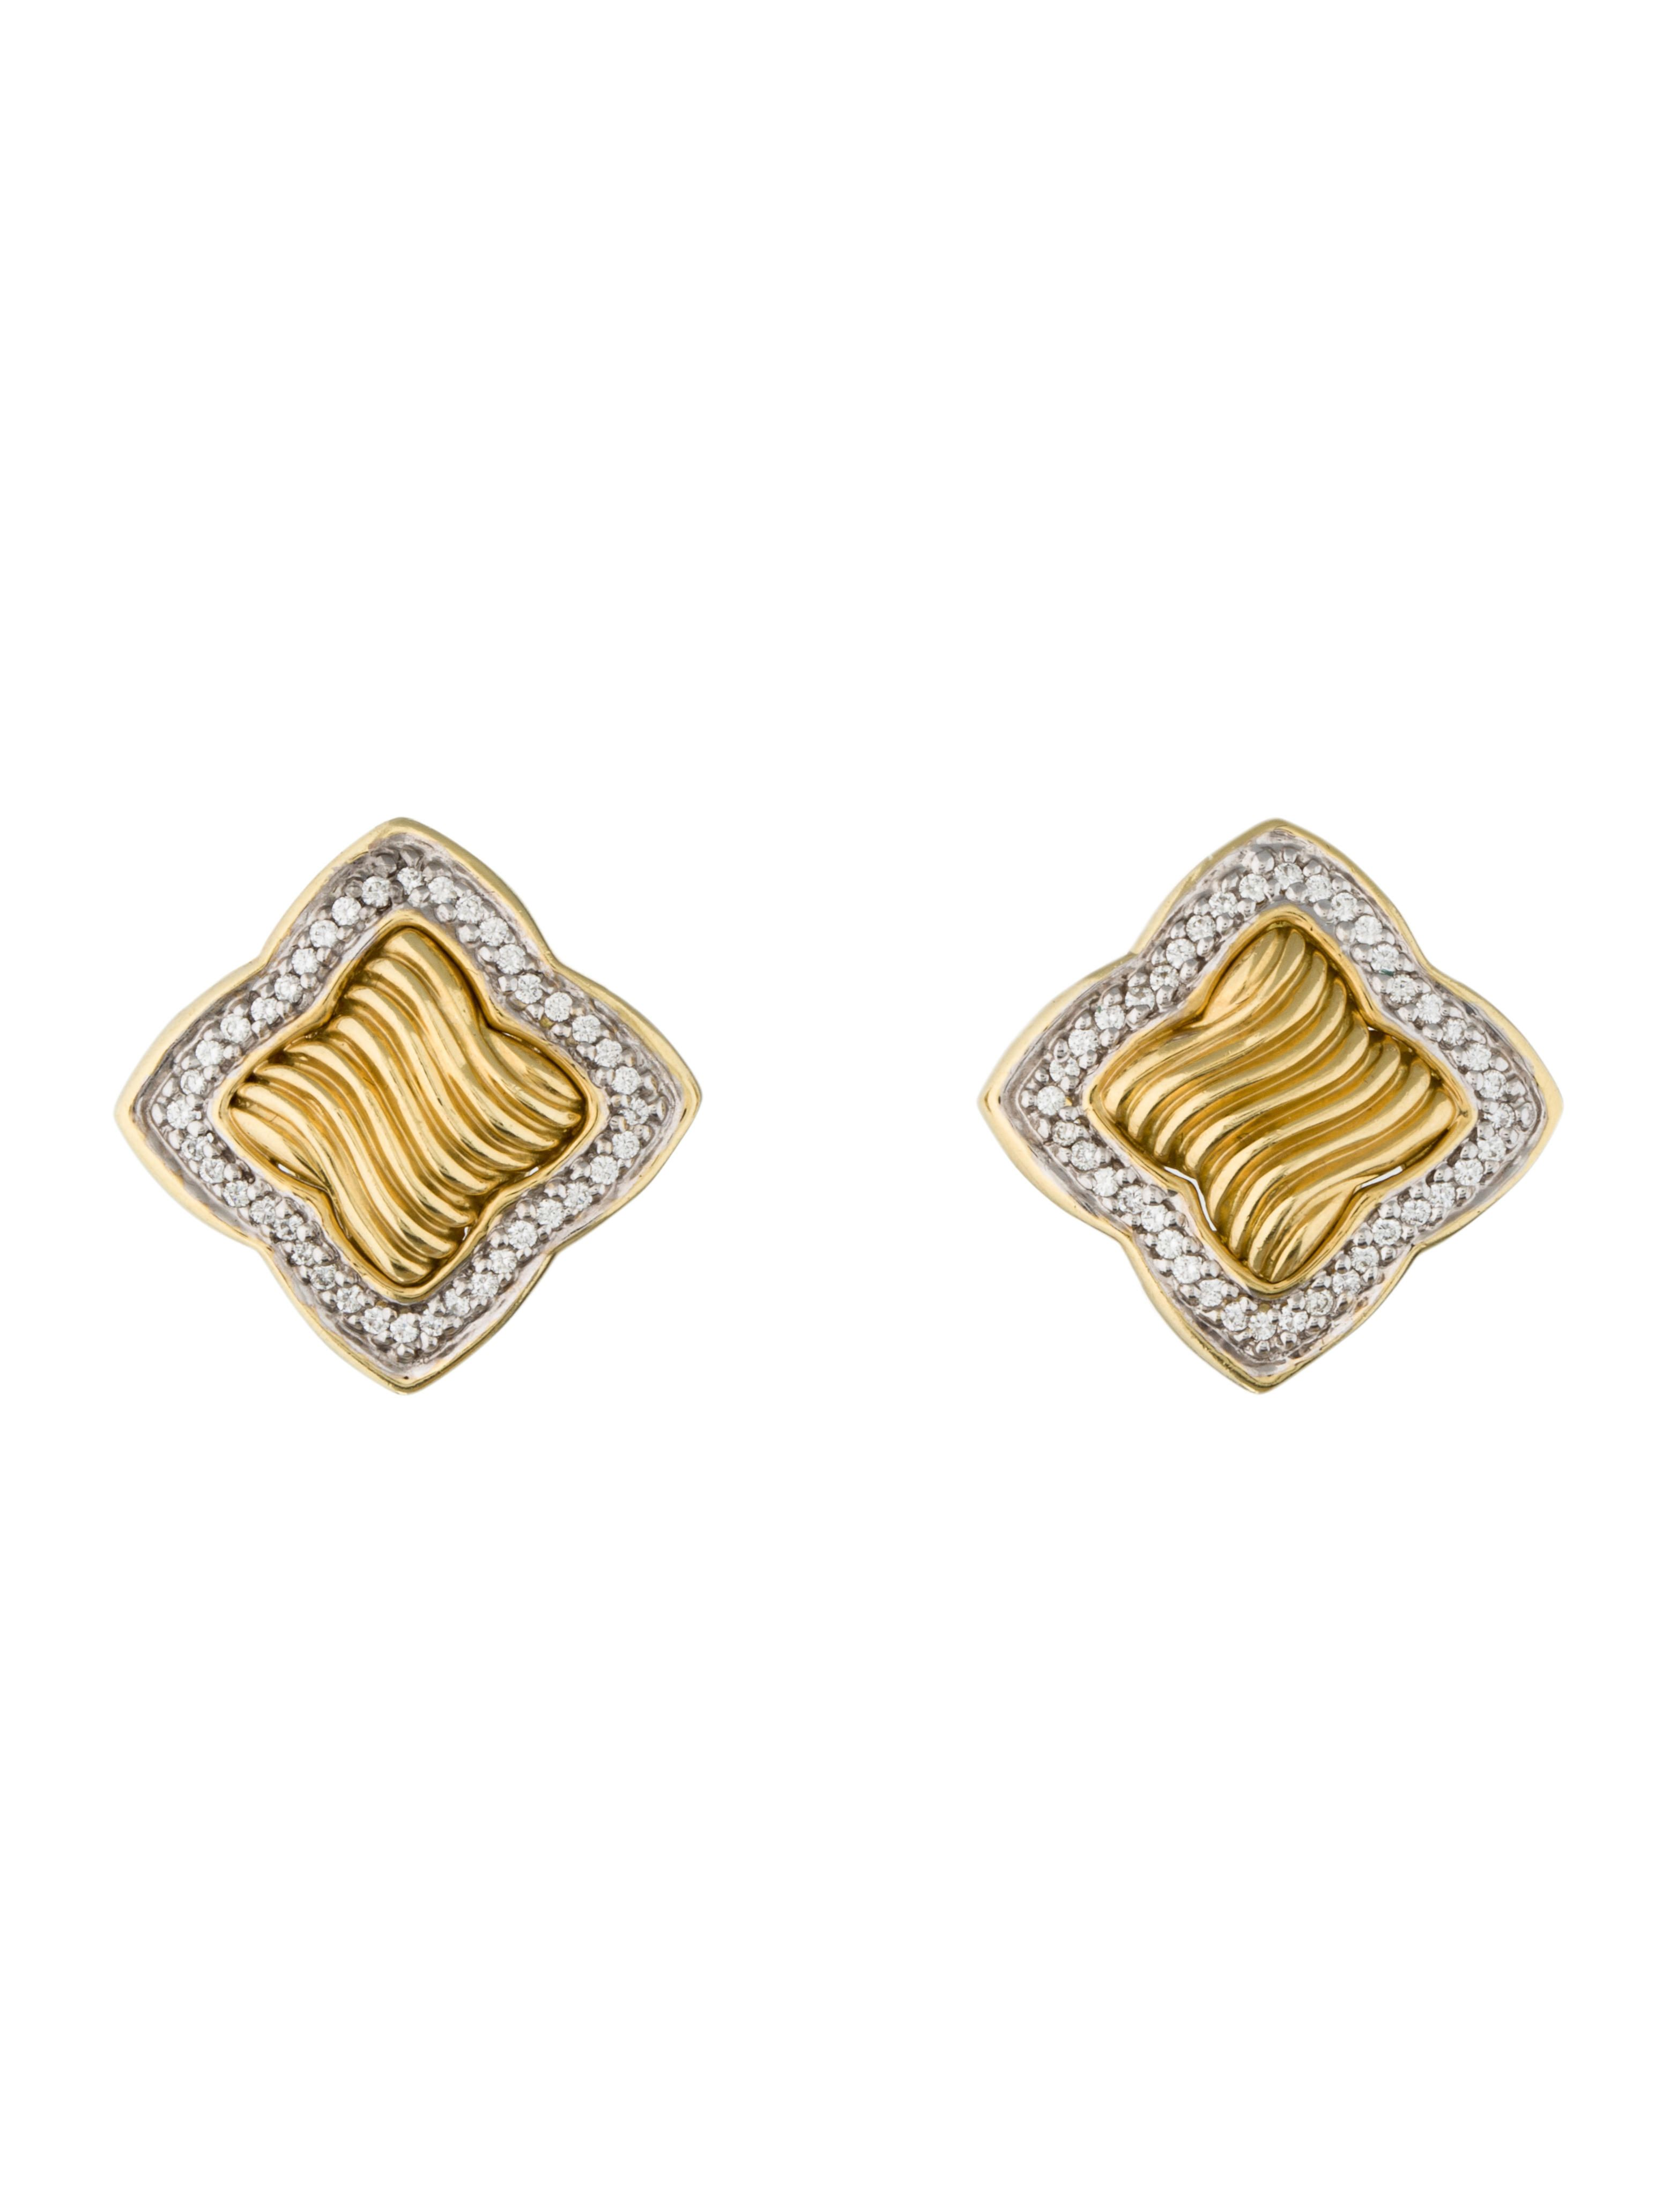 18k Yellow Gold David Yurman Quatrefoil Earring With Pavé Diamond Accents And Clip On Backs